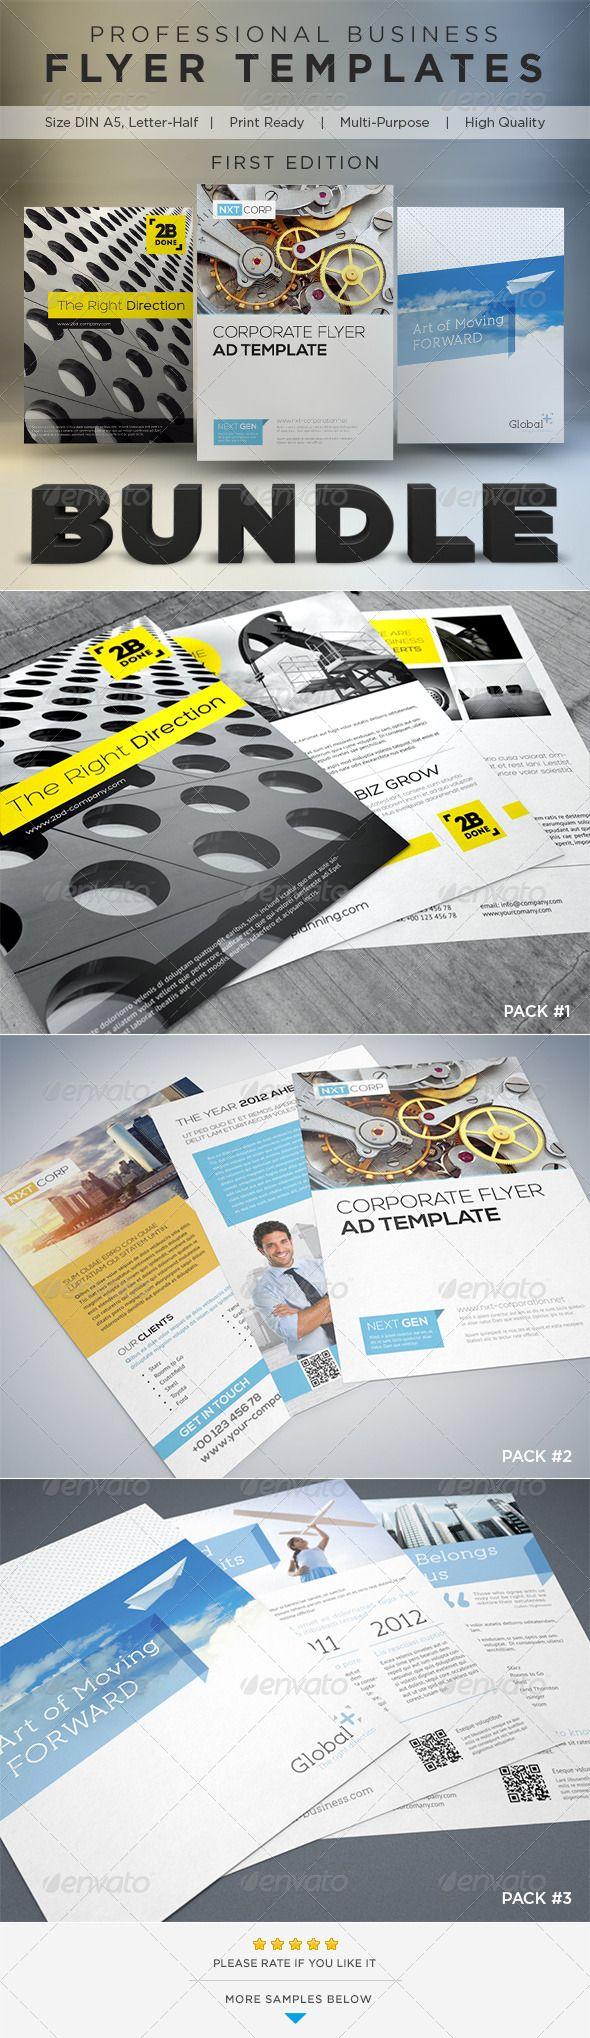 Mejores 438 imágenes de Best Flyer Templates en Pinterest | Diseño ...